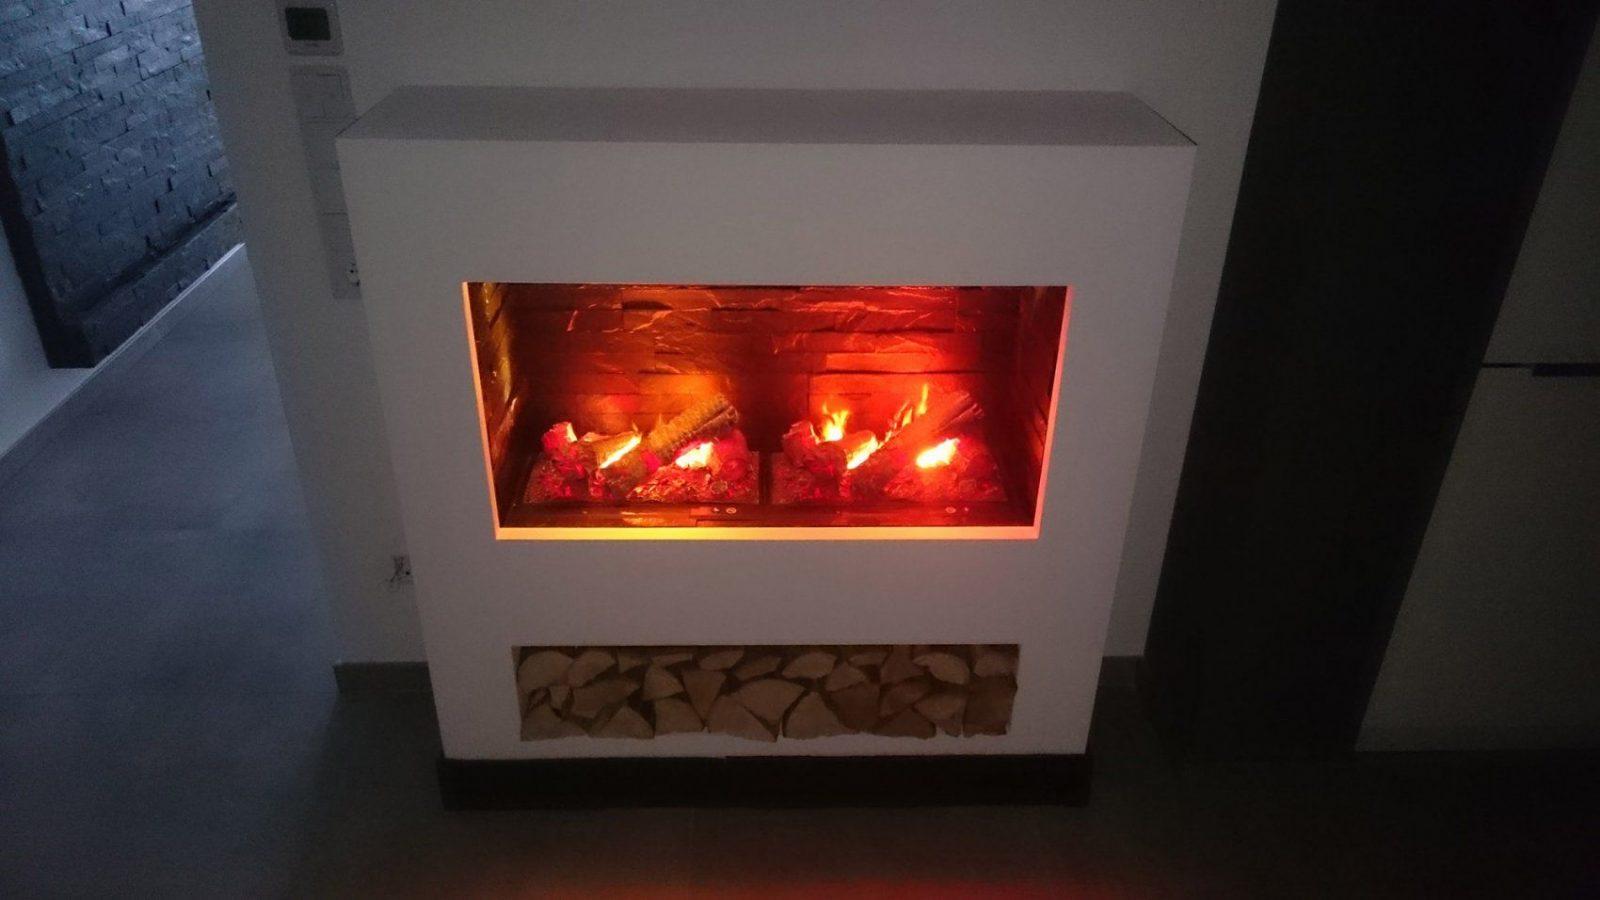 Elektrokamin 3D Flammeneffekt Beste Von Elektrokamin Selber Bauen von Elektrokamine Mit Wasserdampf Feuer Bild